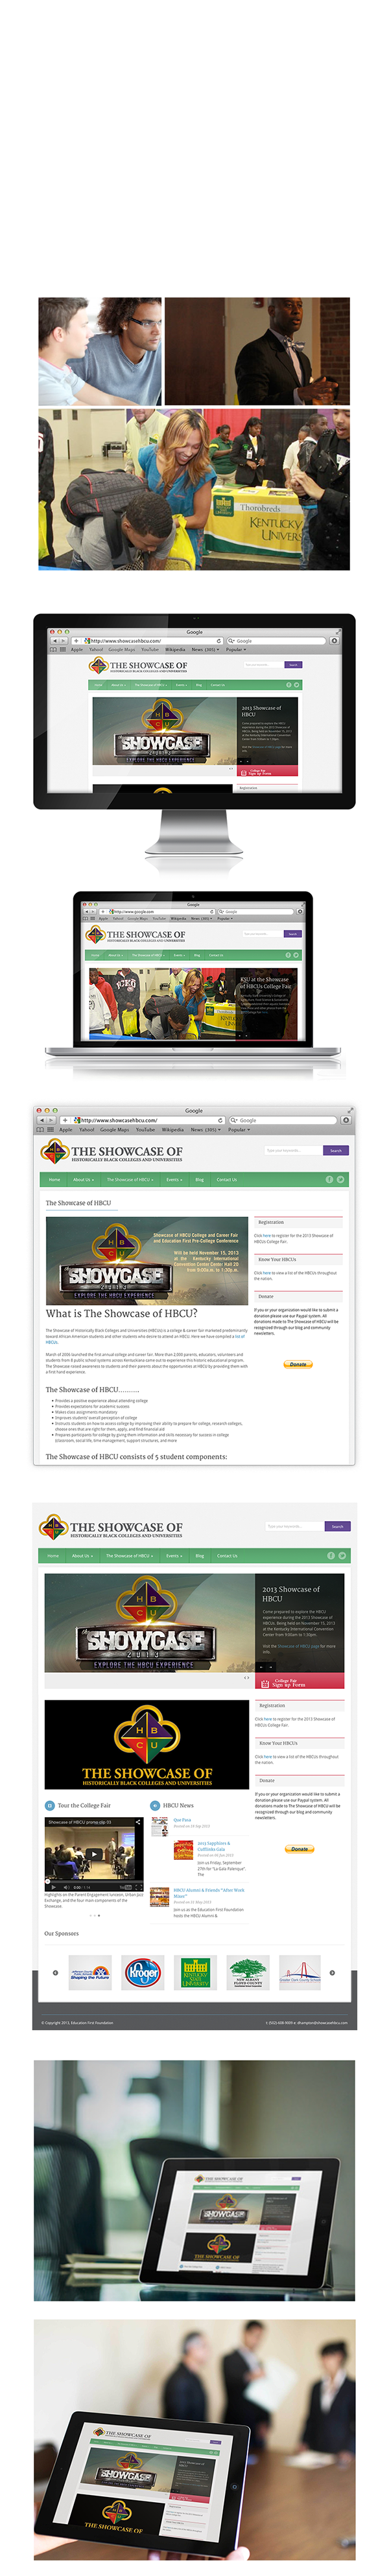 HBCU Historically Black Colleges Web wordpress